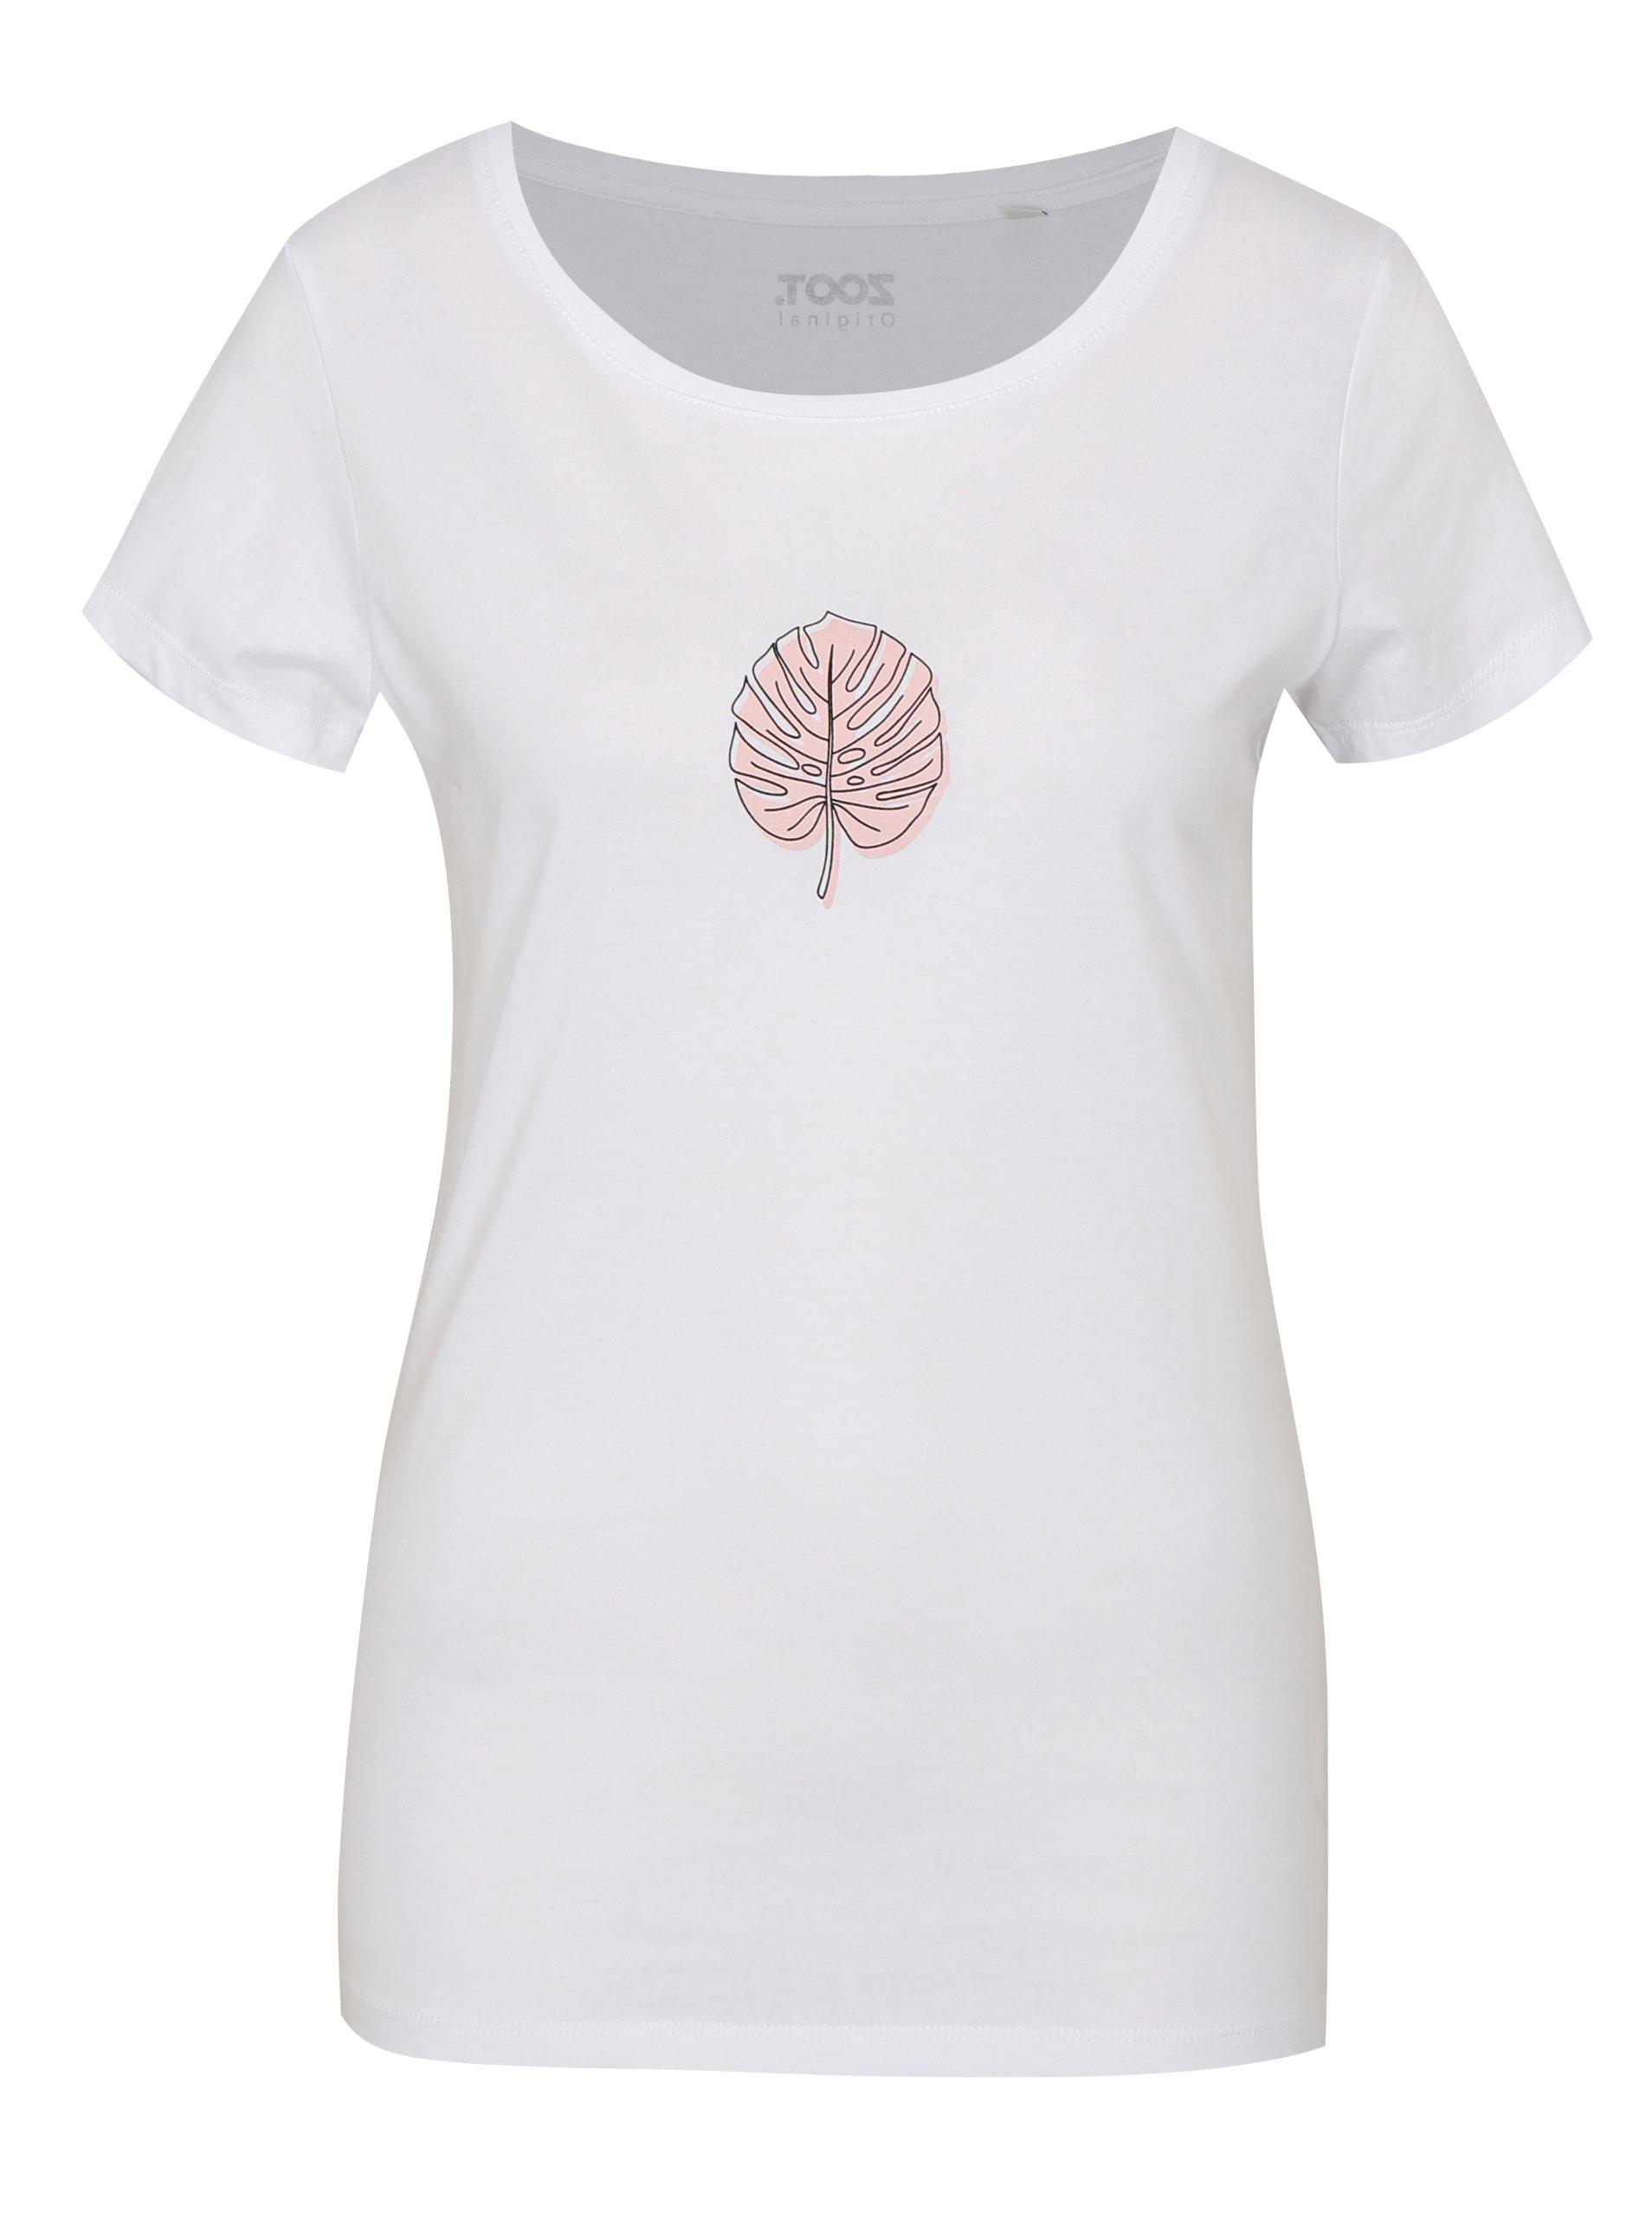 Bílé dámské tričko ZOOT Original Monstera 1fe23ab662